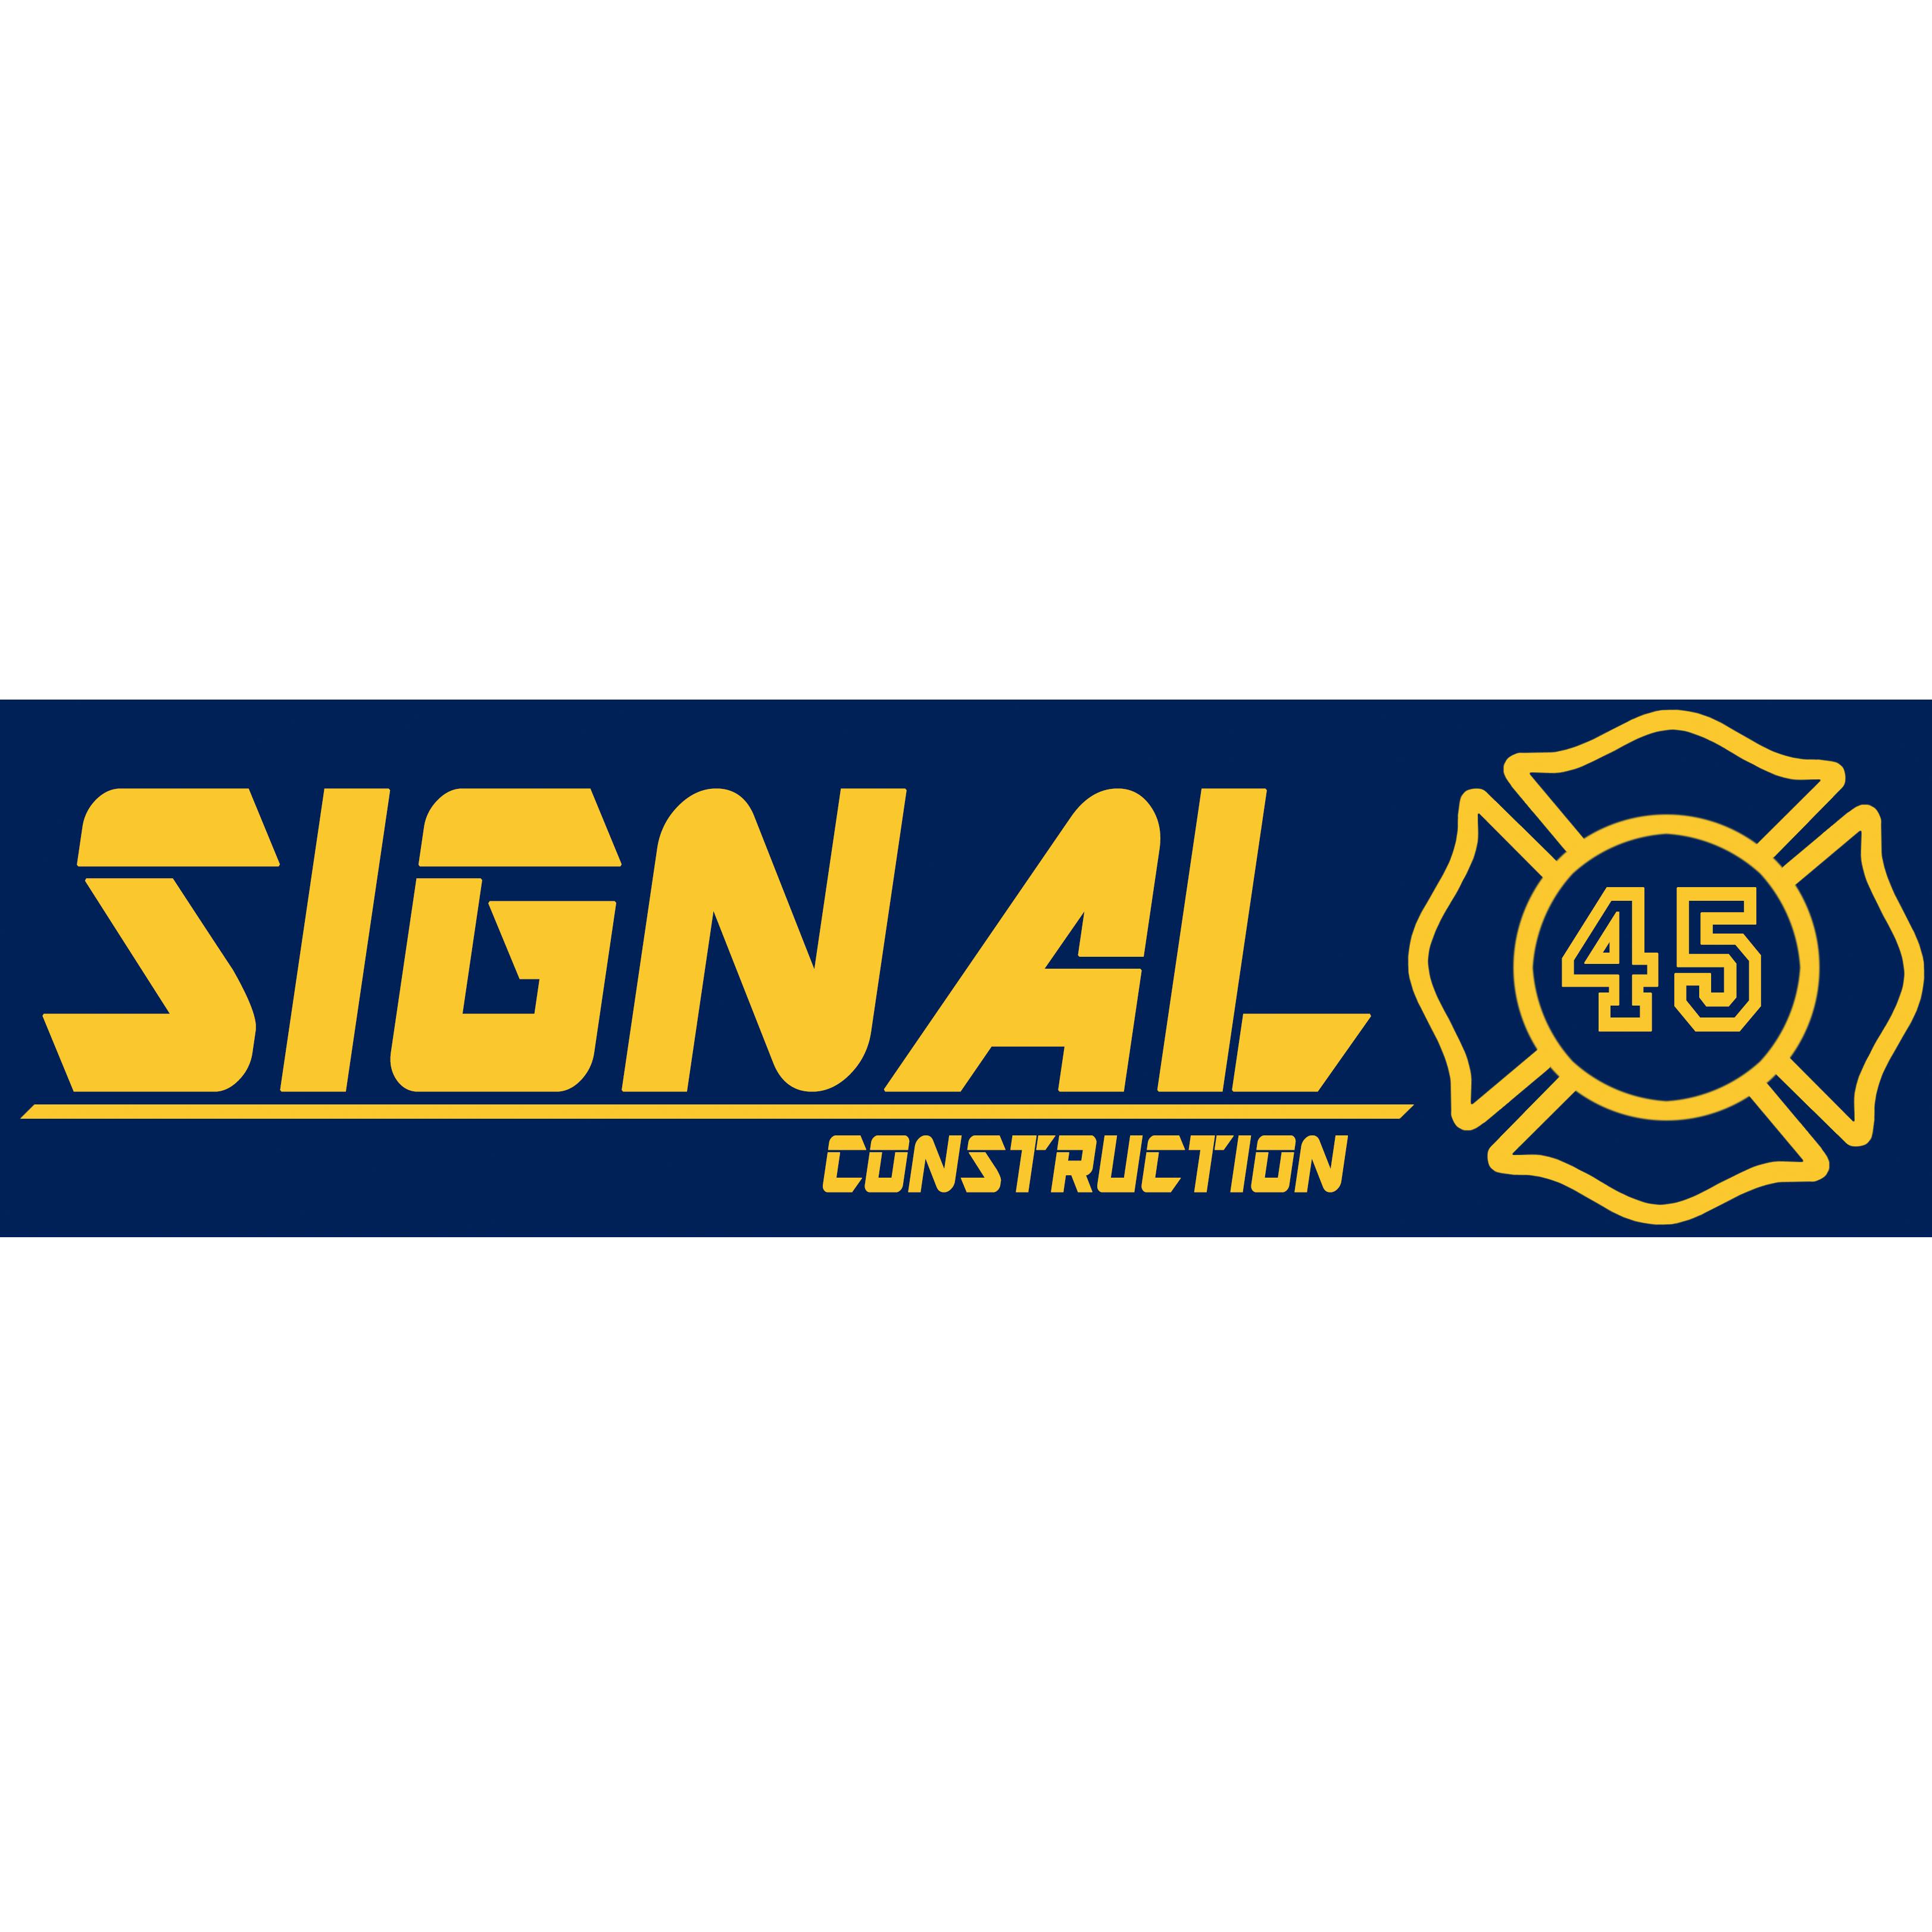 Signal 45 Construction